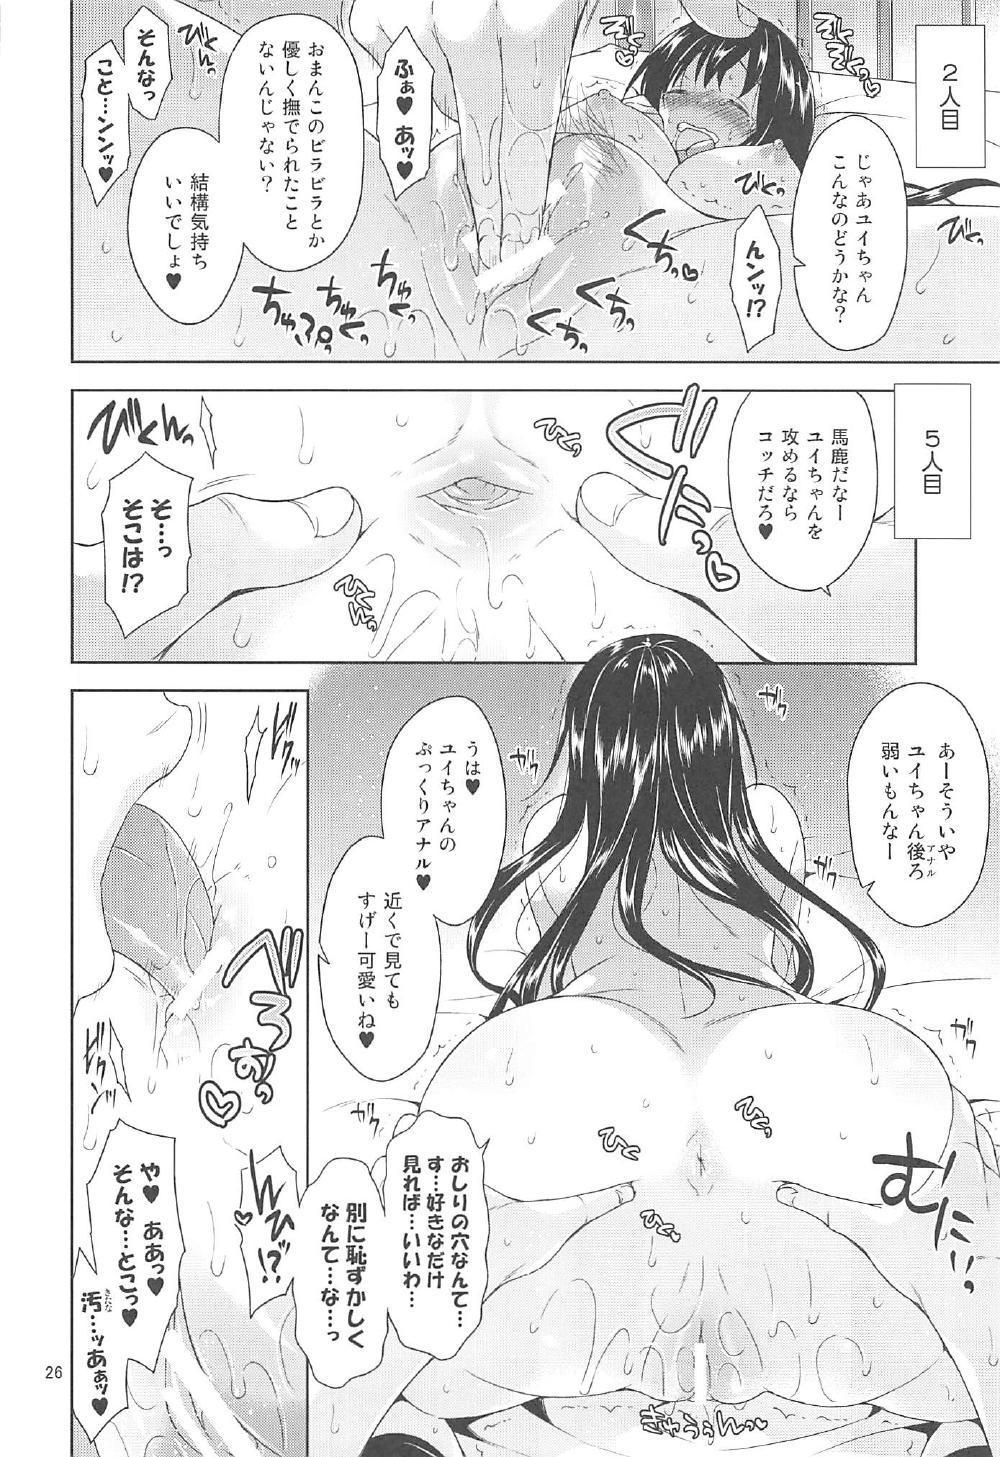 Sairoku March Trouble 3 24